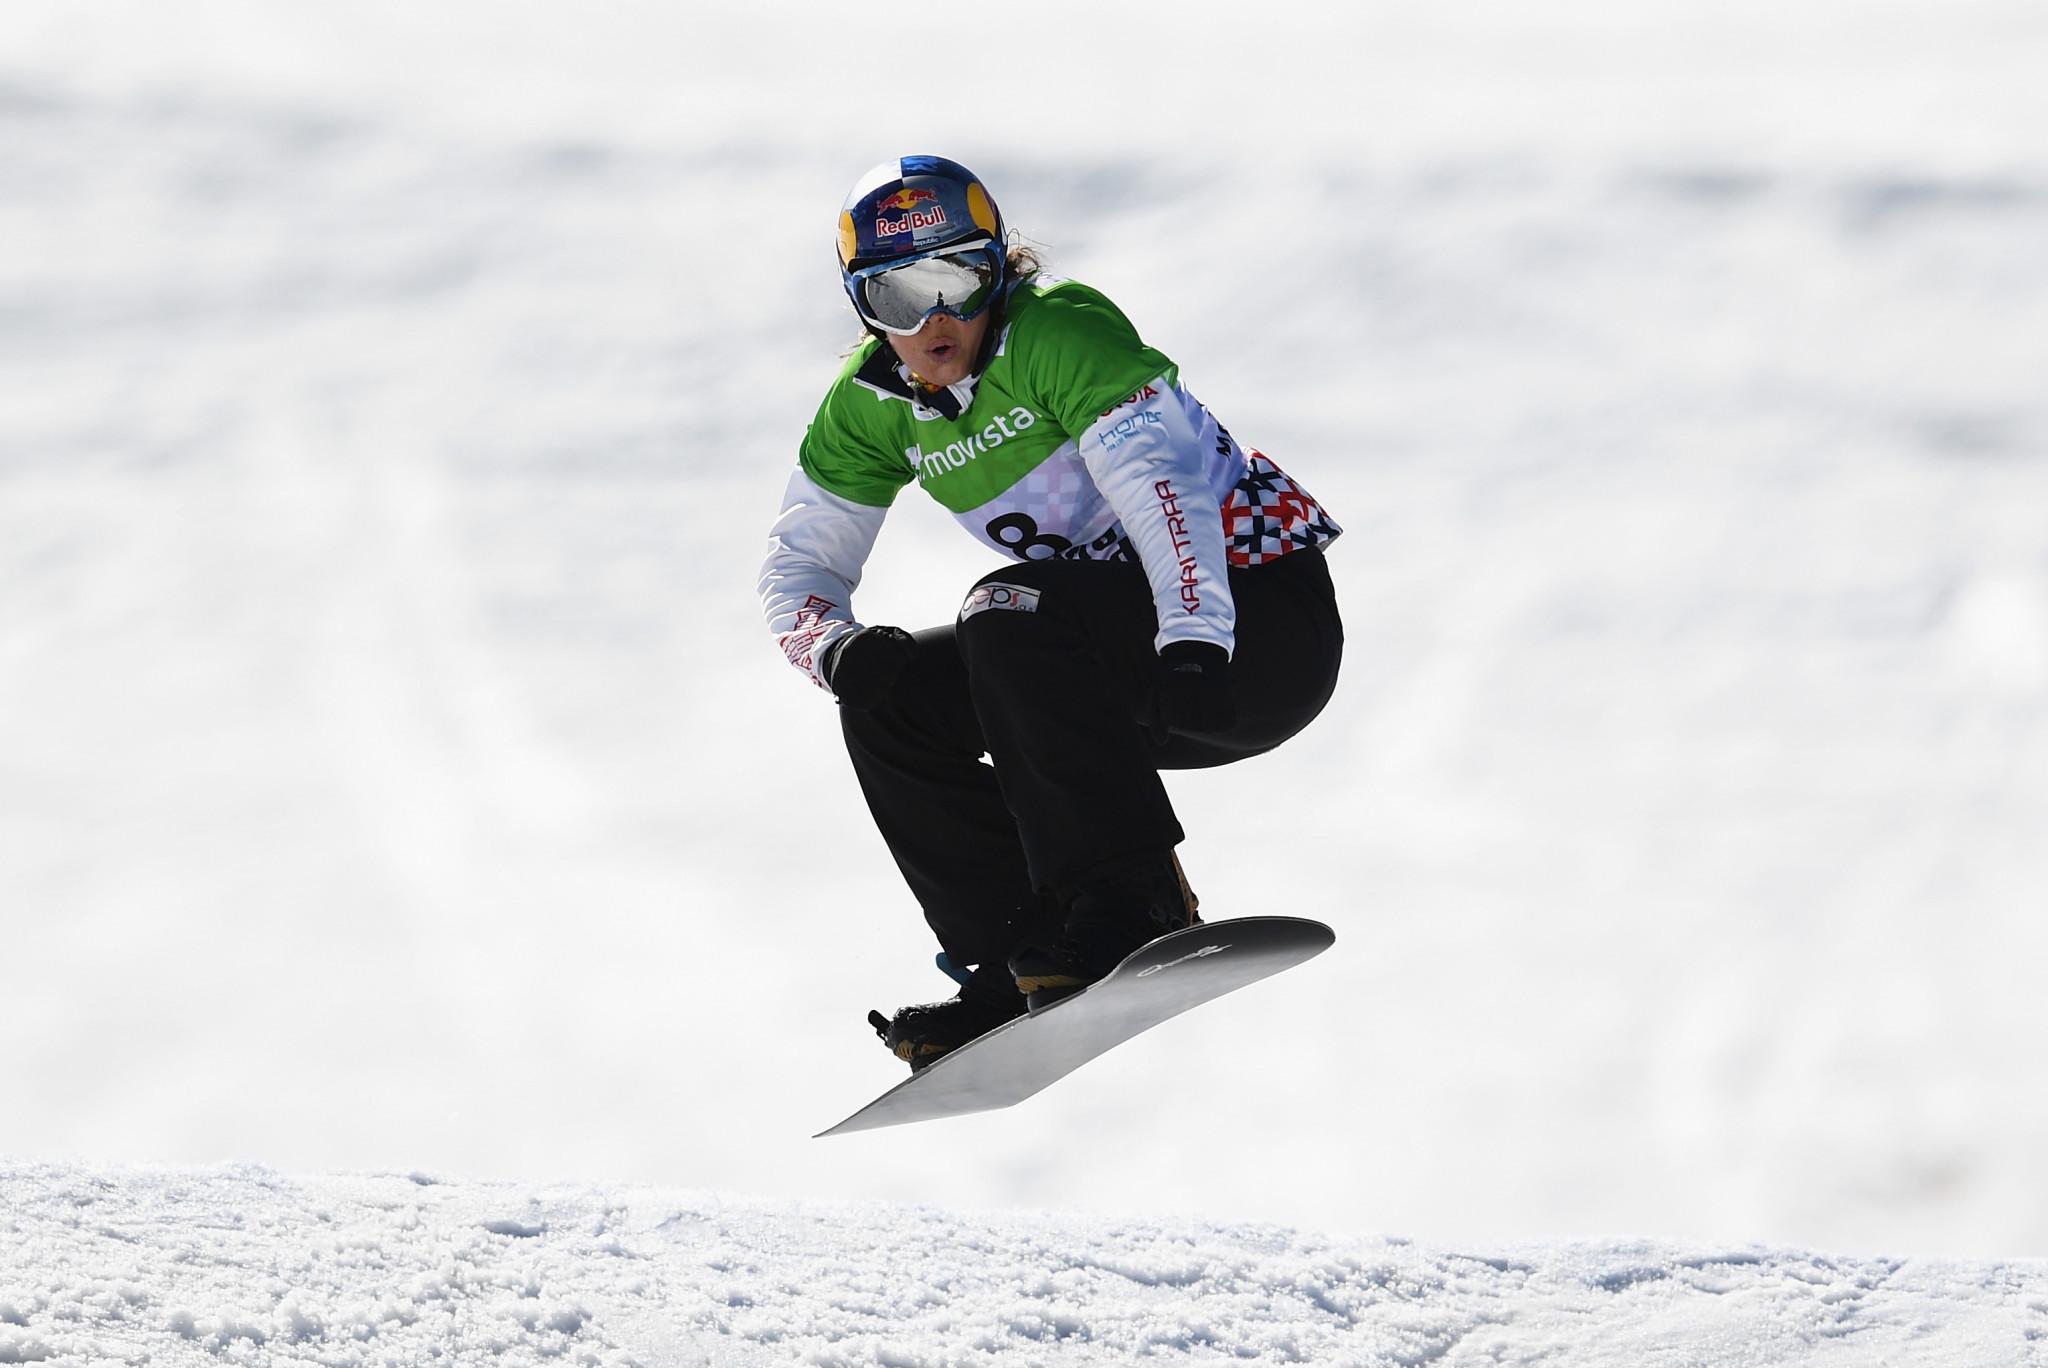 Olympic champion Samková makes impressive start to FIS Snowboard Cross World Cup campaign